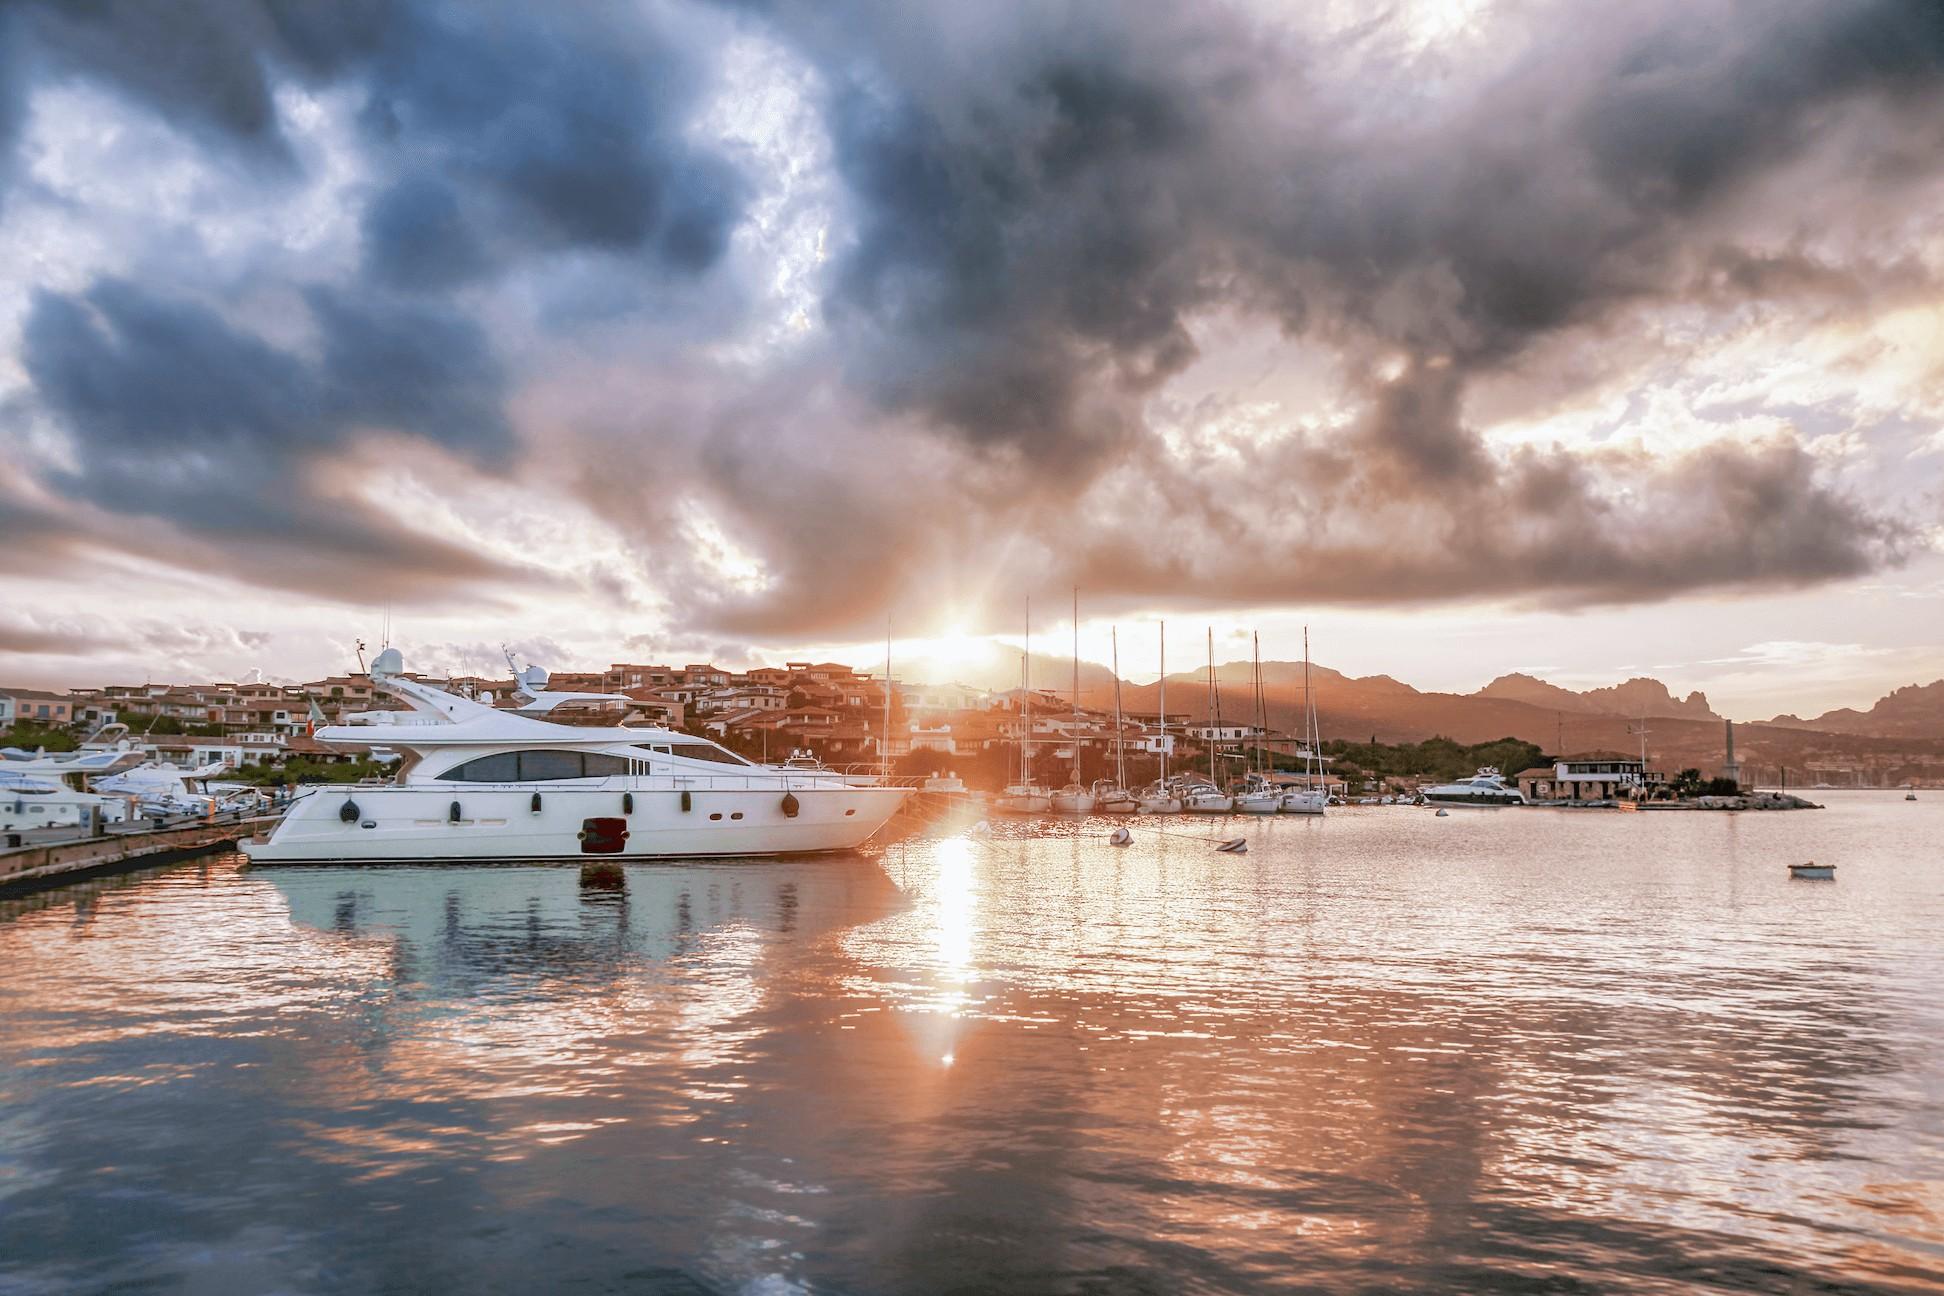 sardinia-yacht-charter-sardinia-yacht-rental-sardinia-sailing-charter-luxury-yacht-sardinia-sardinia-yacht-hire-luxury-crewed-motor-sail-yacht